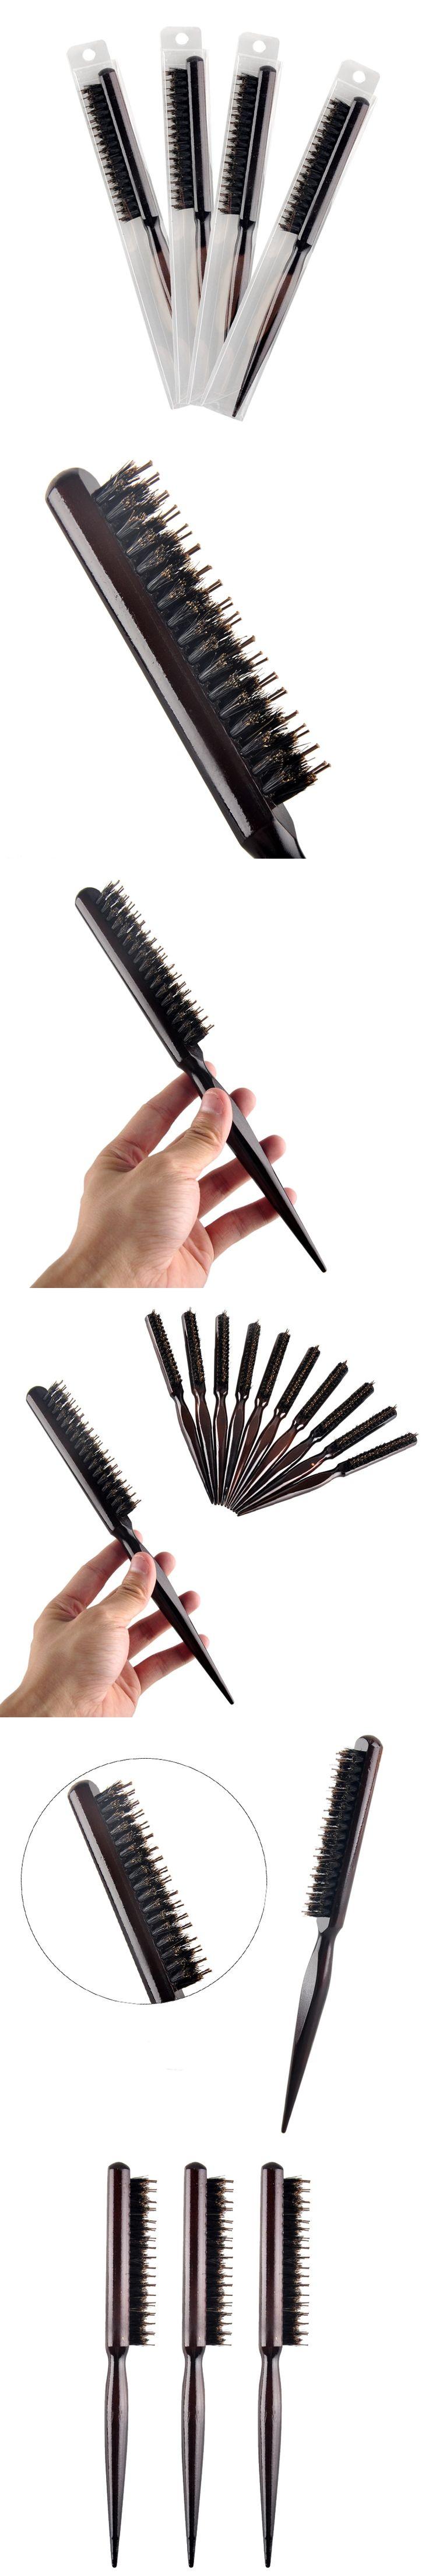 Women Girl's Wood Handle Natural Boar Bristle Hair Brush Fluffy Hair Comb Hairdressing Barber Tool